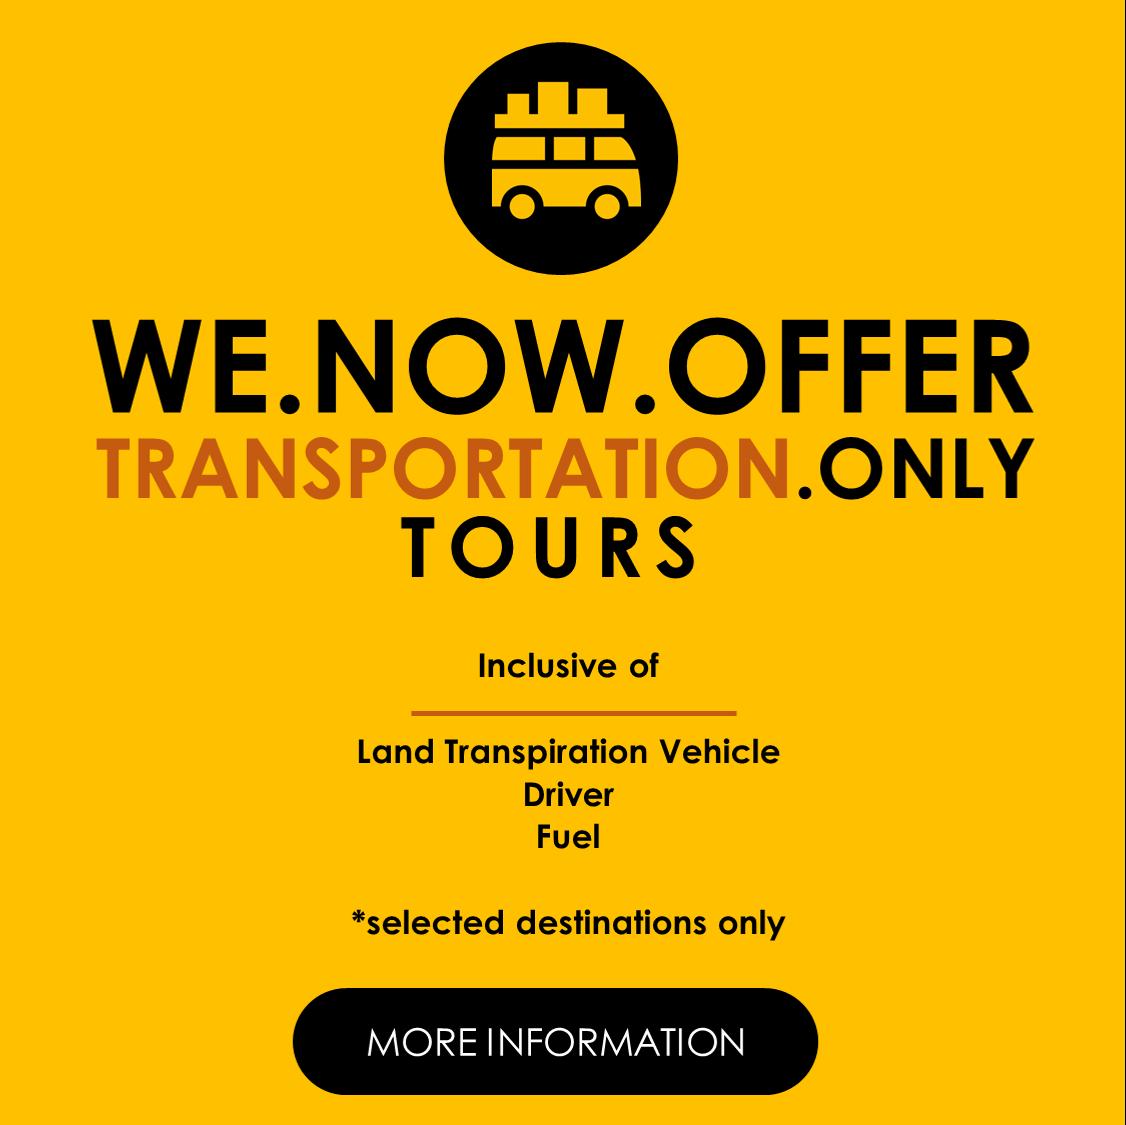 Transportation Only Cebu